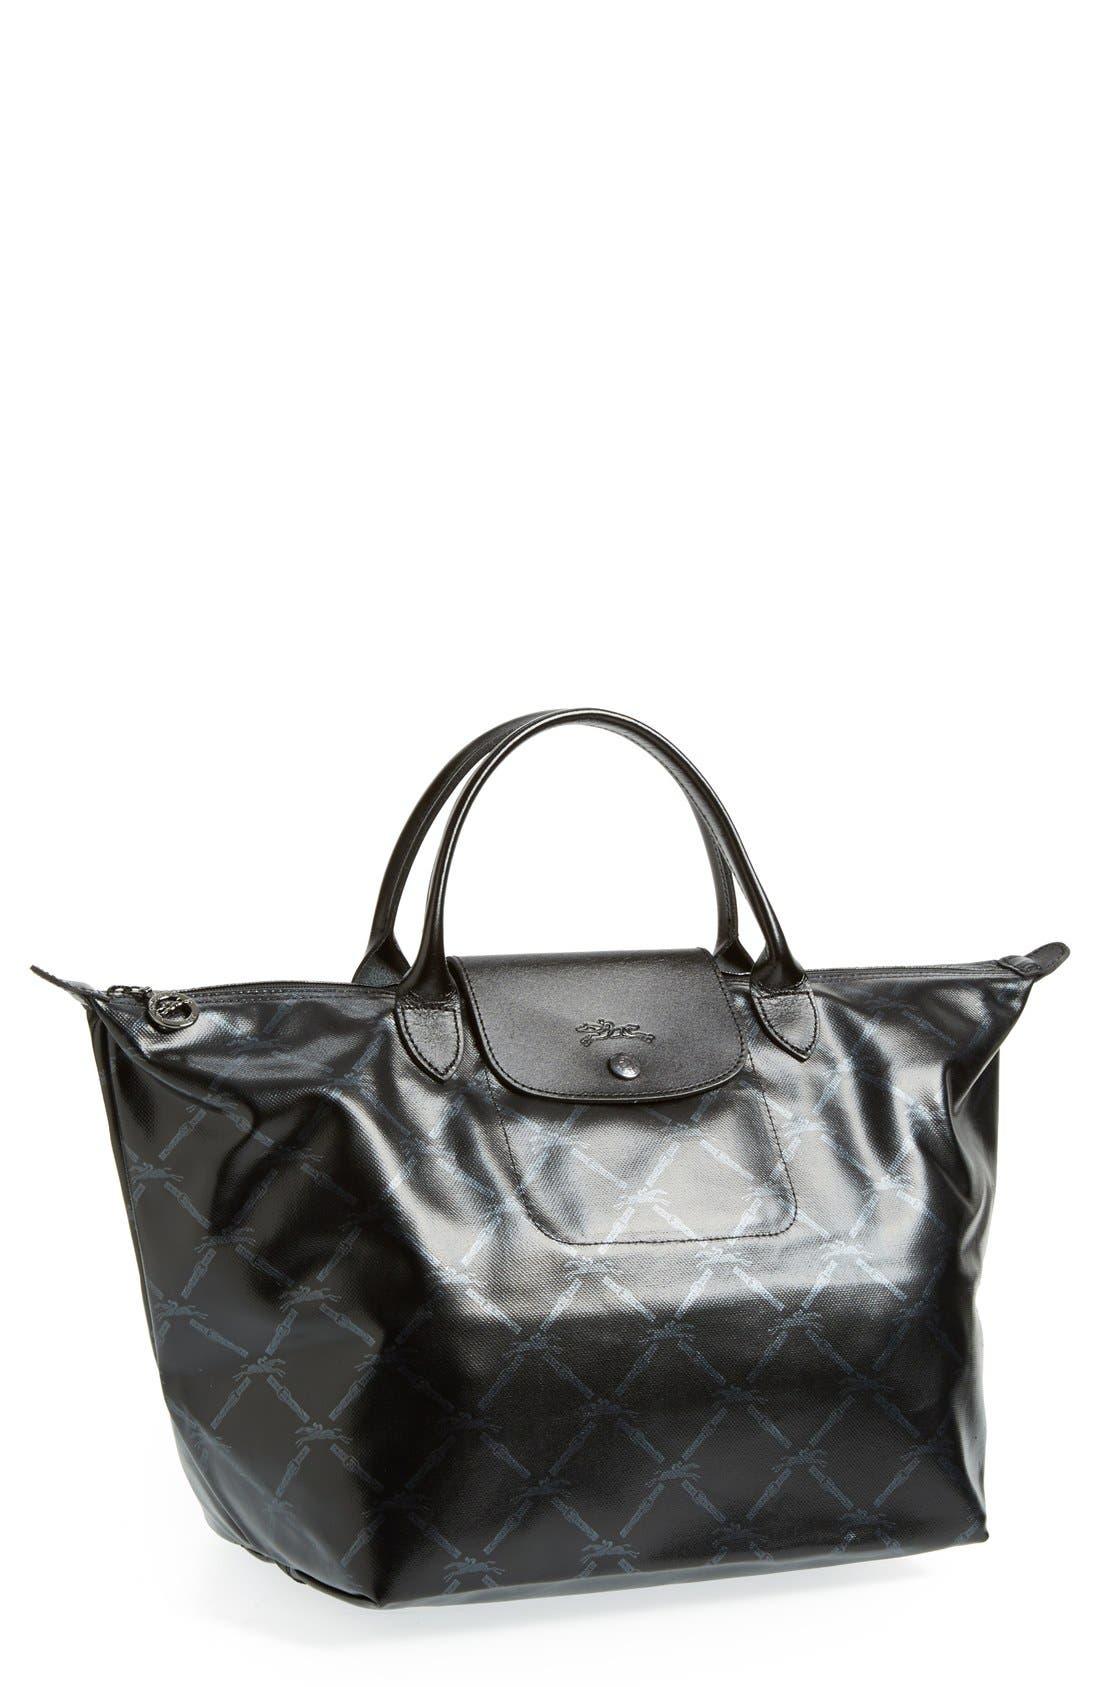 Main Image - Longchamp 'LM Metal' Handbag